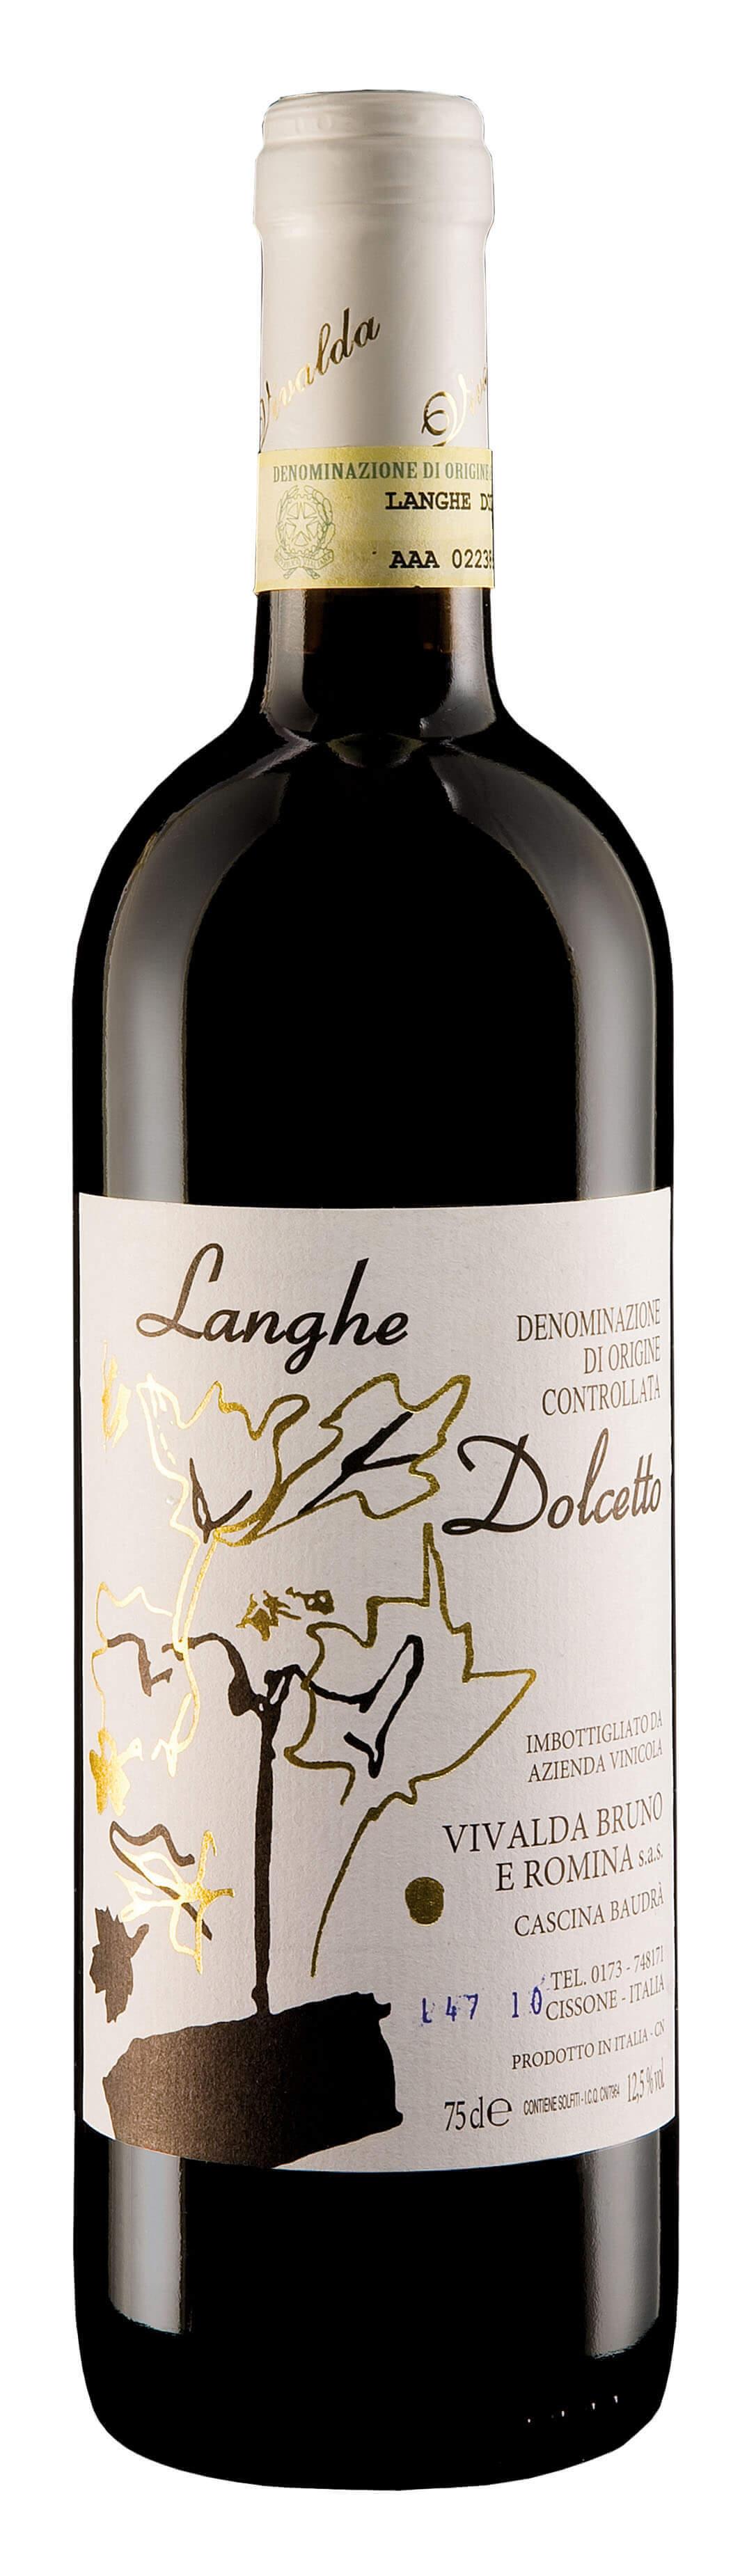 Vivalda Vini - Langhe Dolcetto